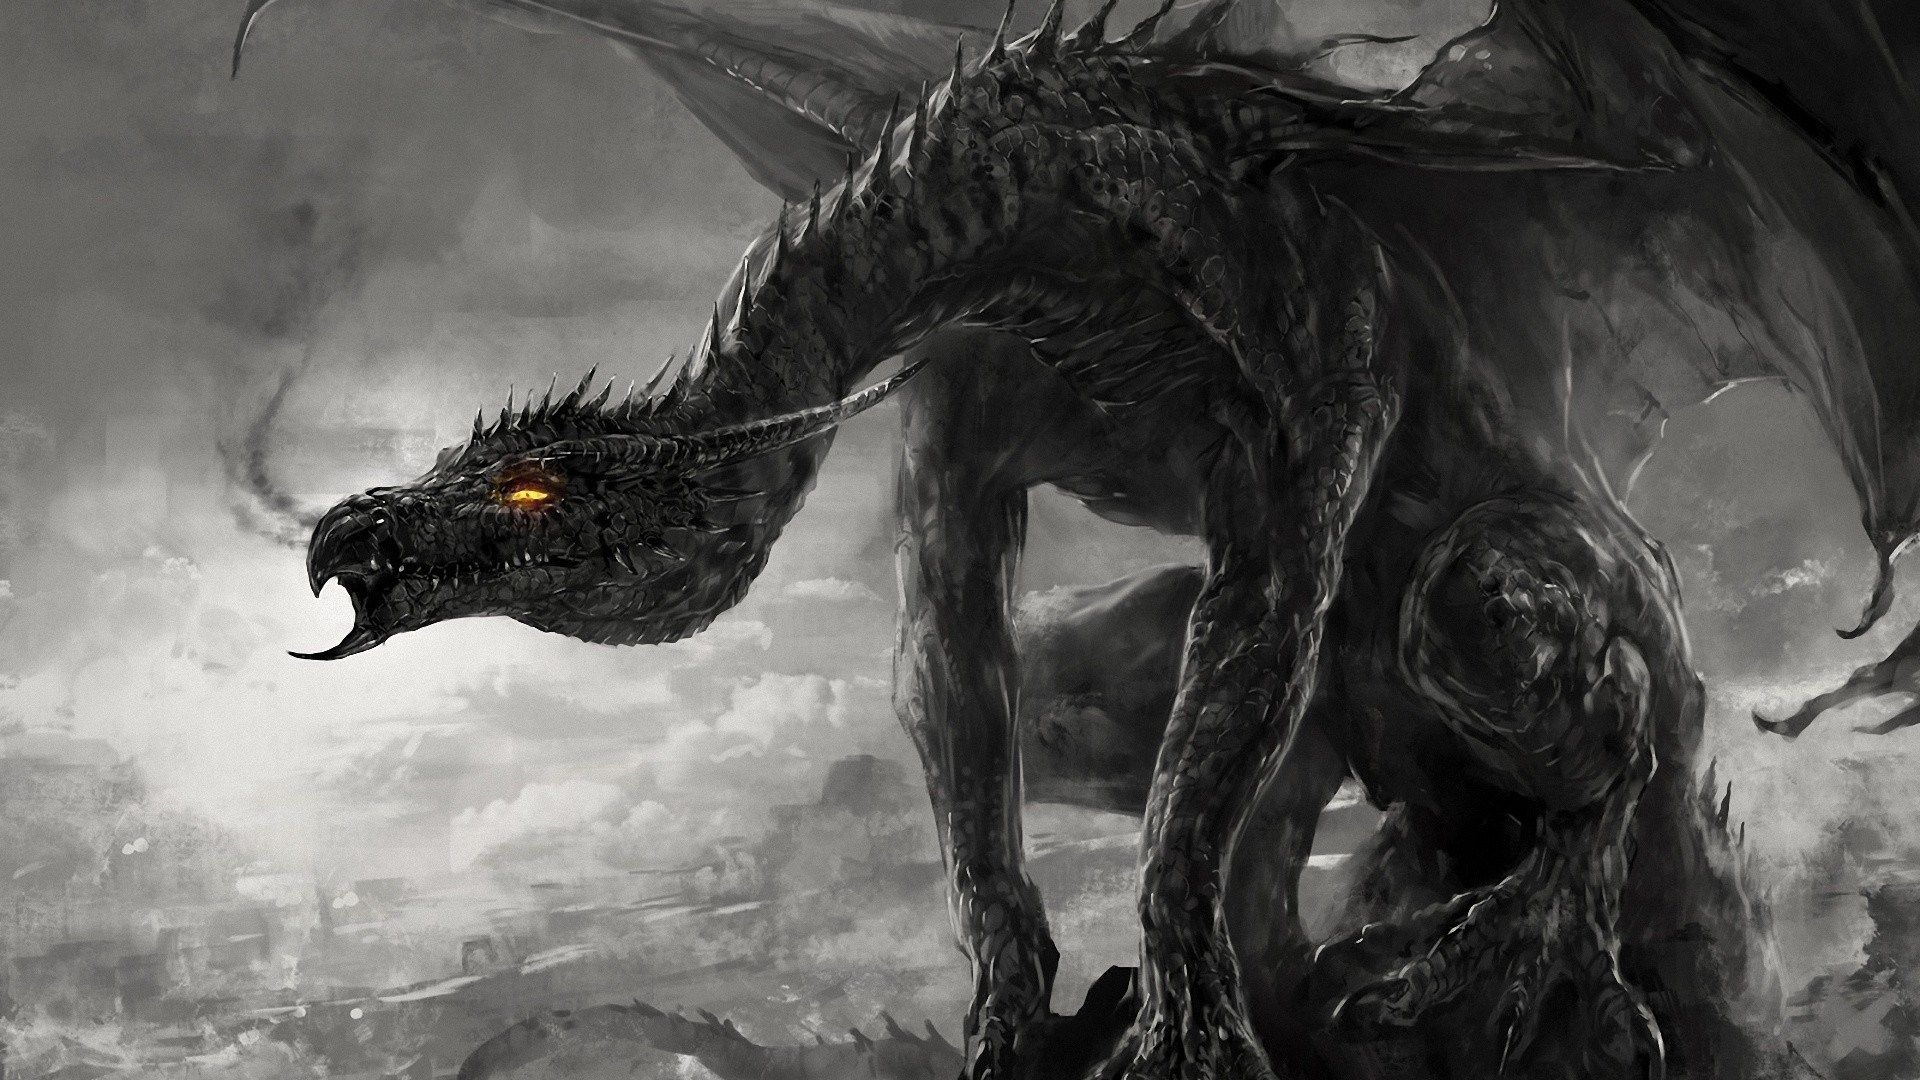 Dragon Hd Wallpapers 1080p Windows Dragon Pictures Dragon Images Fantasy Dragon